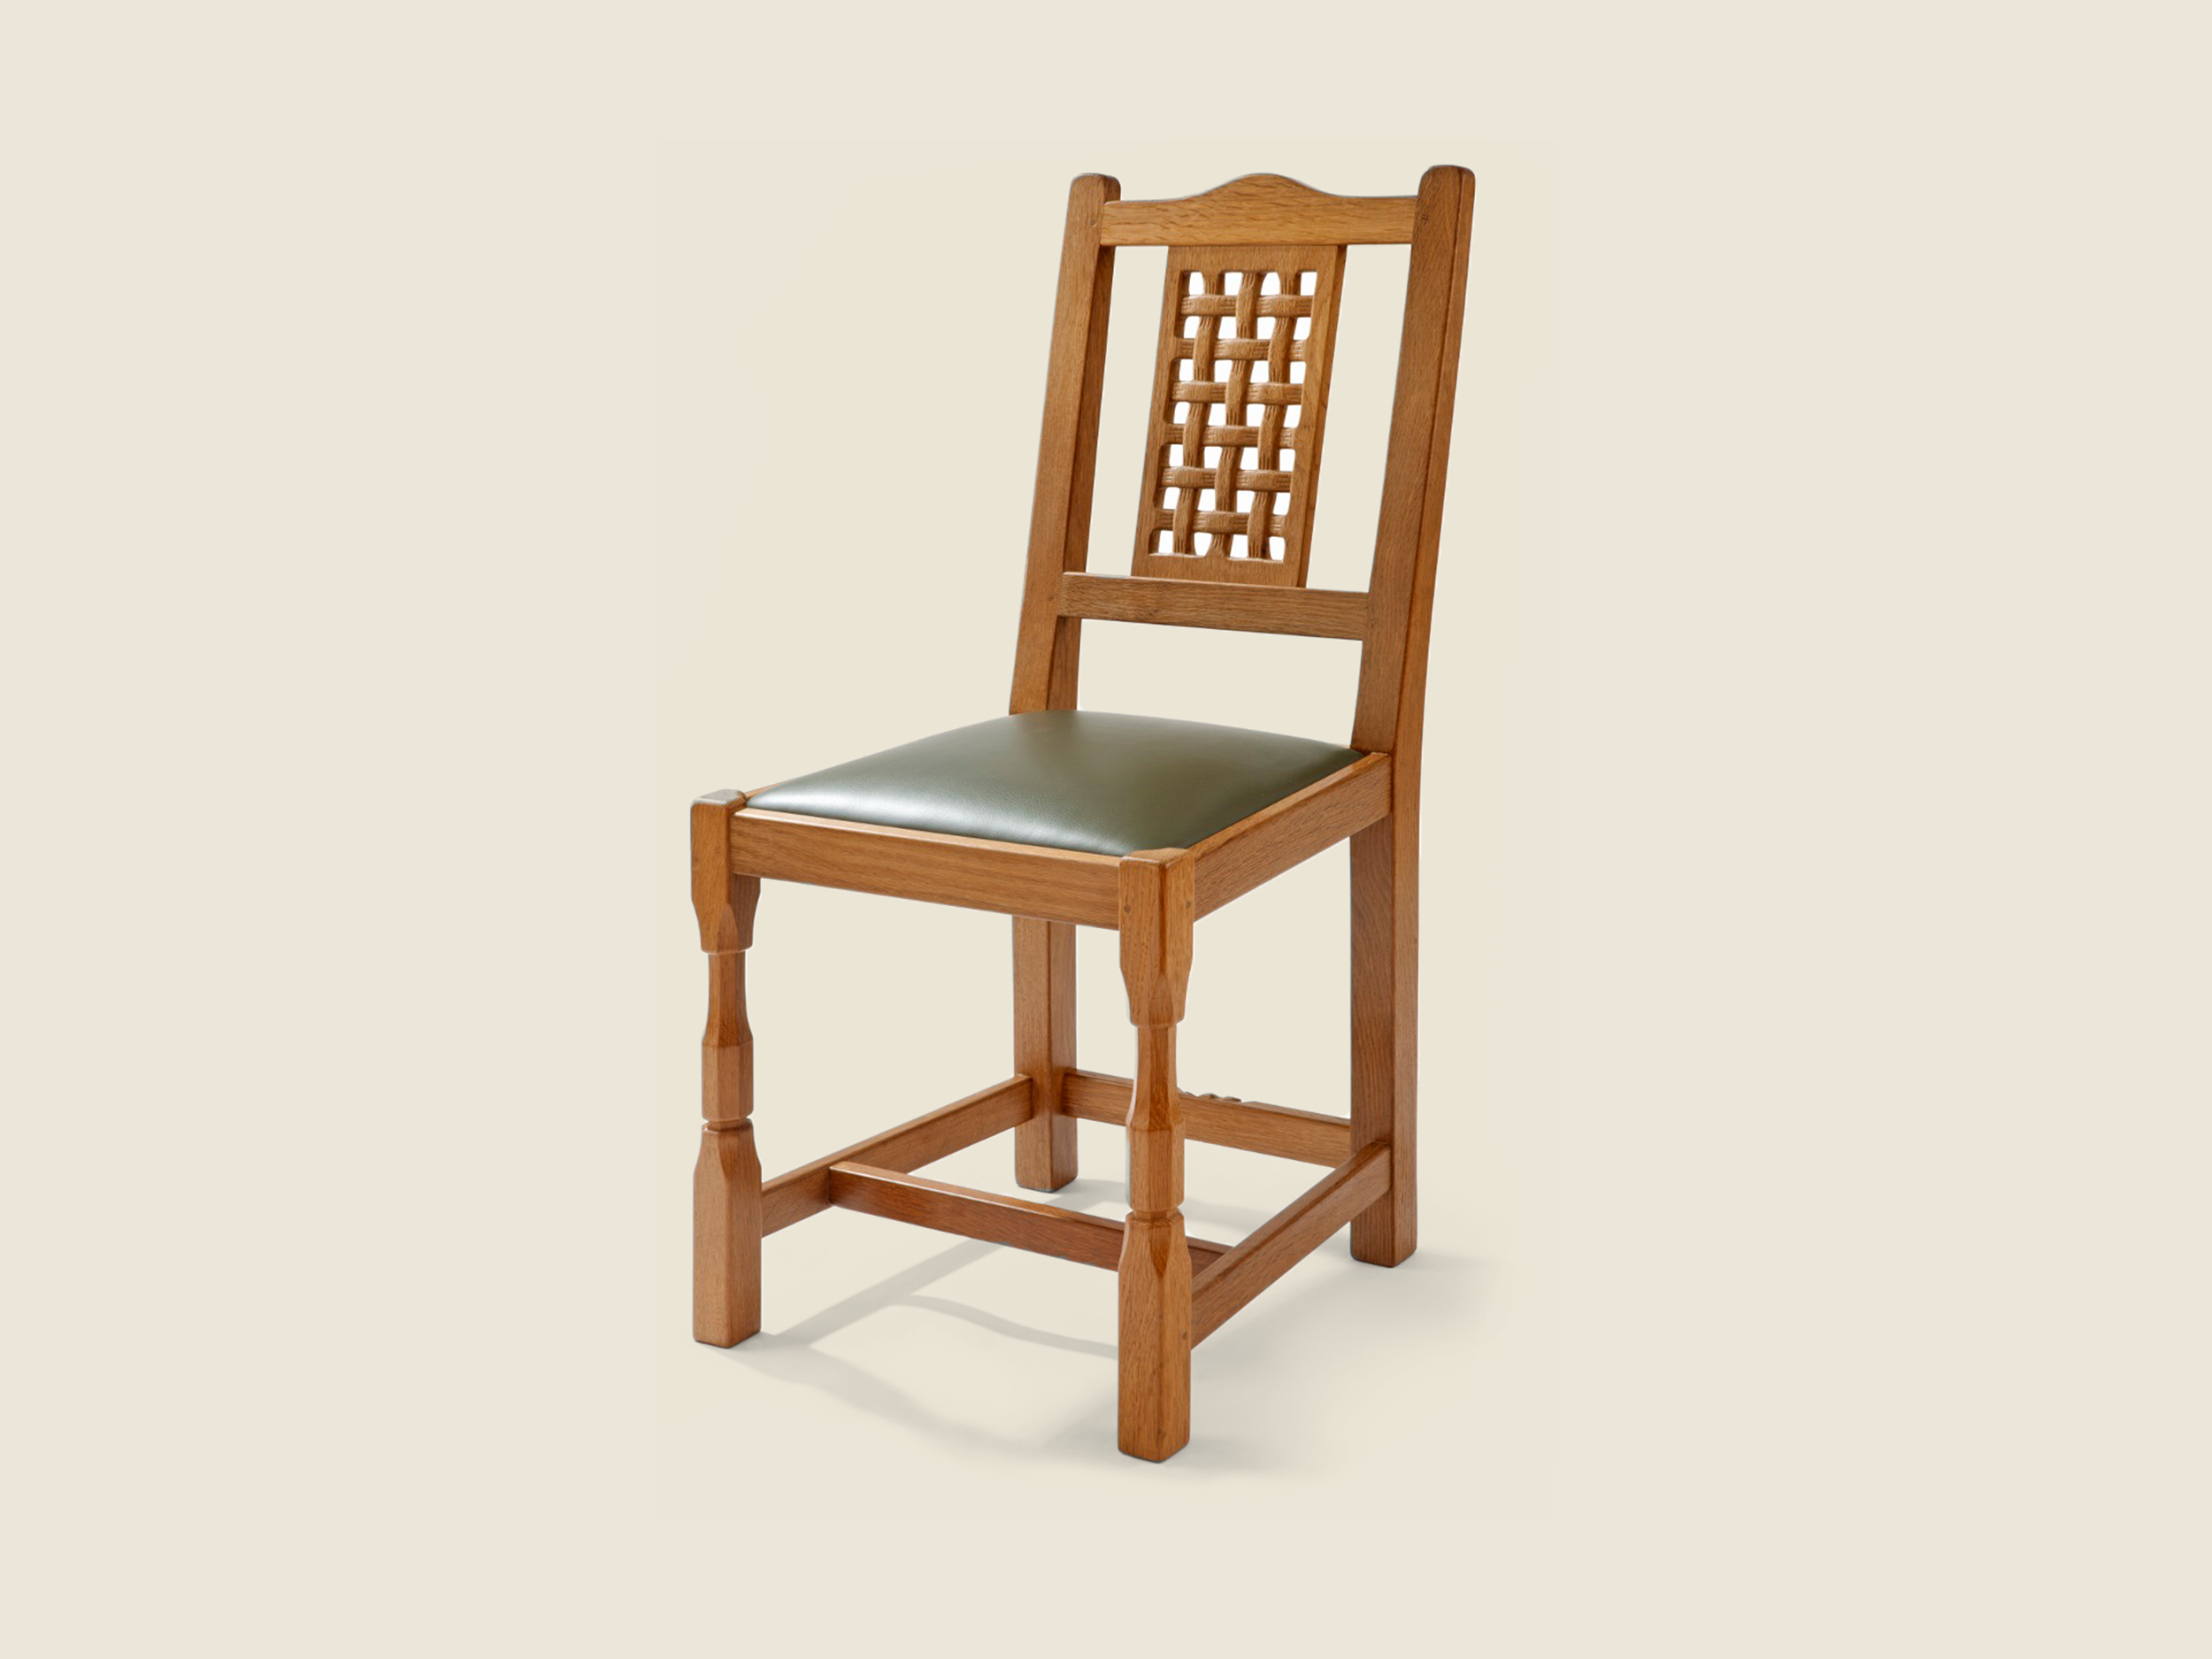 beaver-furniture-makers-handmade-lattice-back-dining-chair